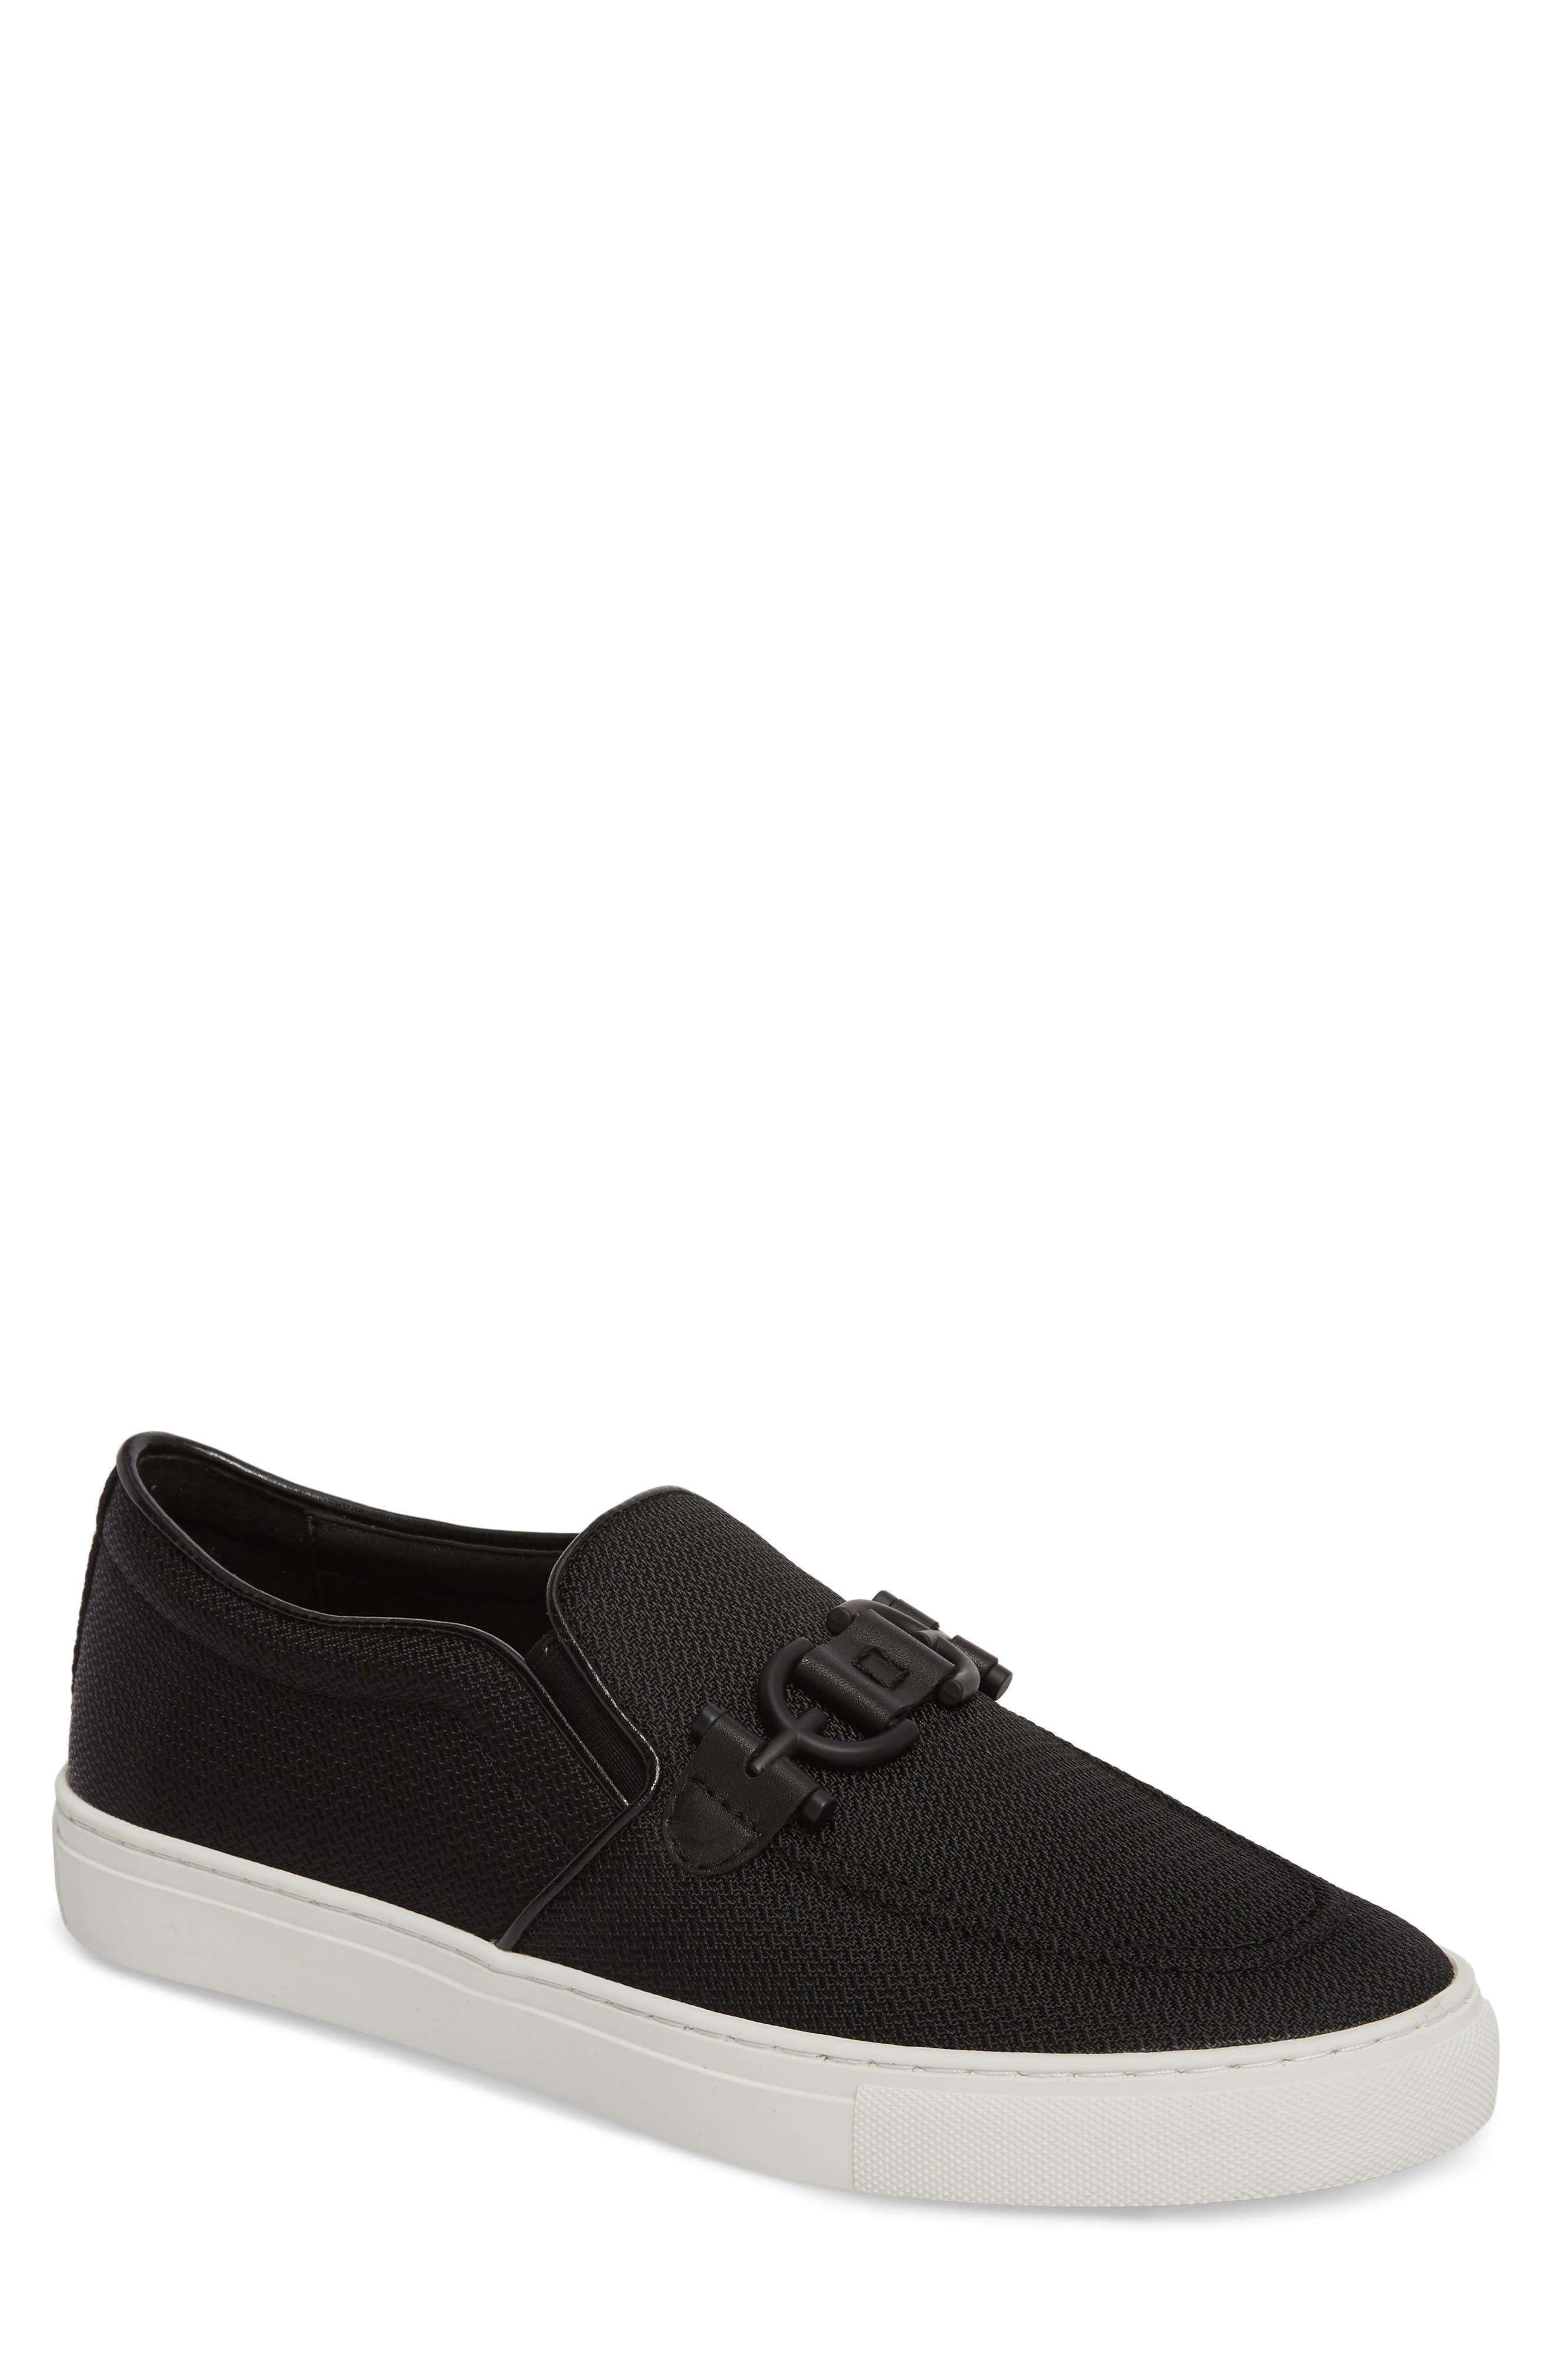 Andor Bit Slip-On Sneaker,                         Main,                         color, Black Mesh